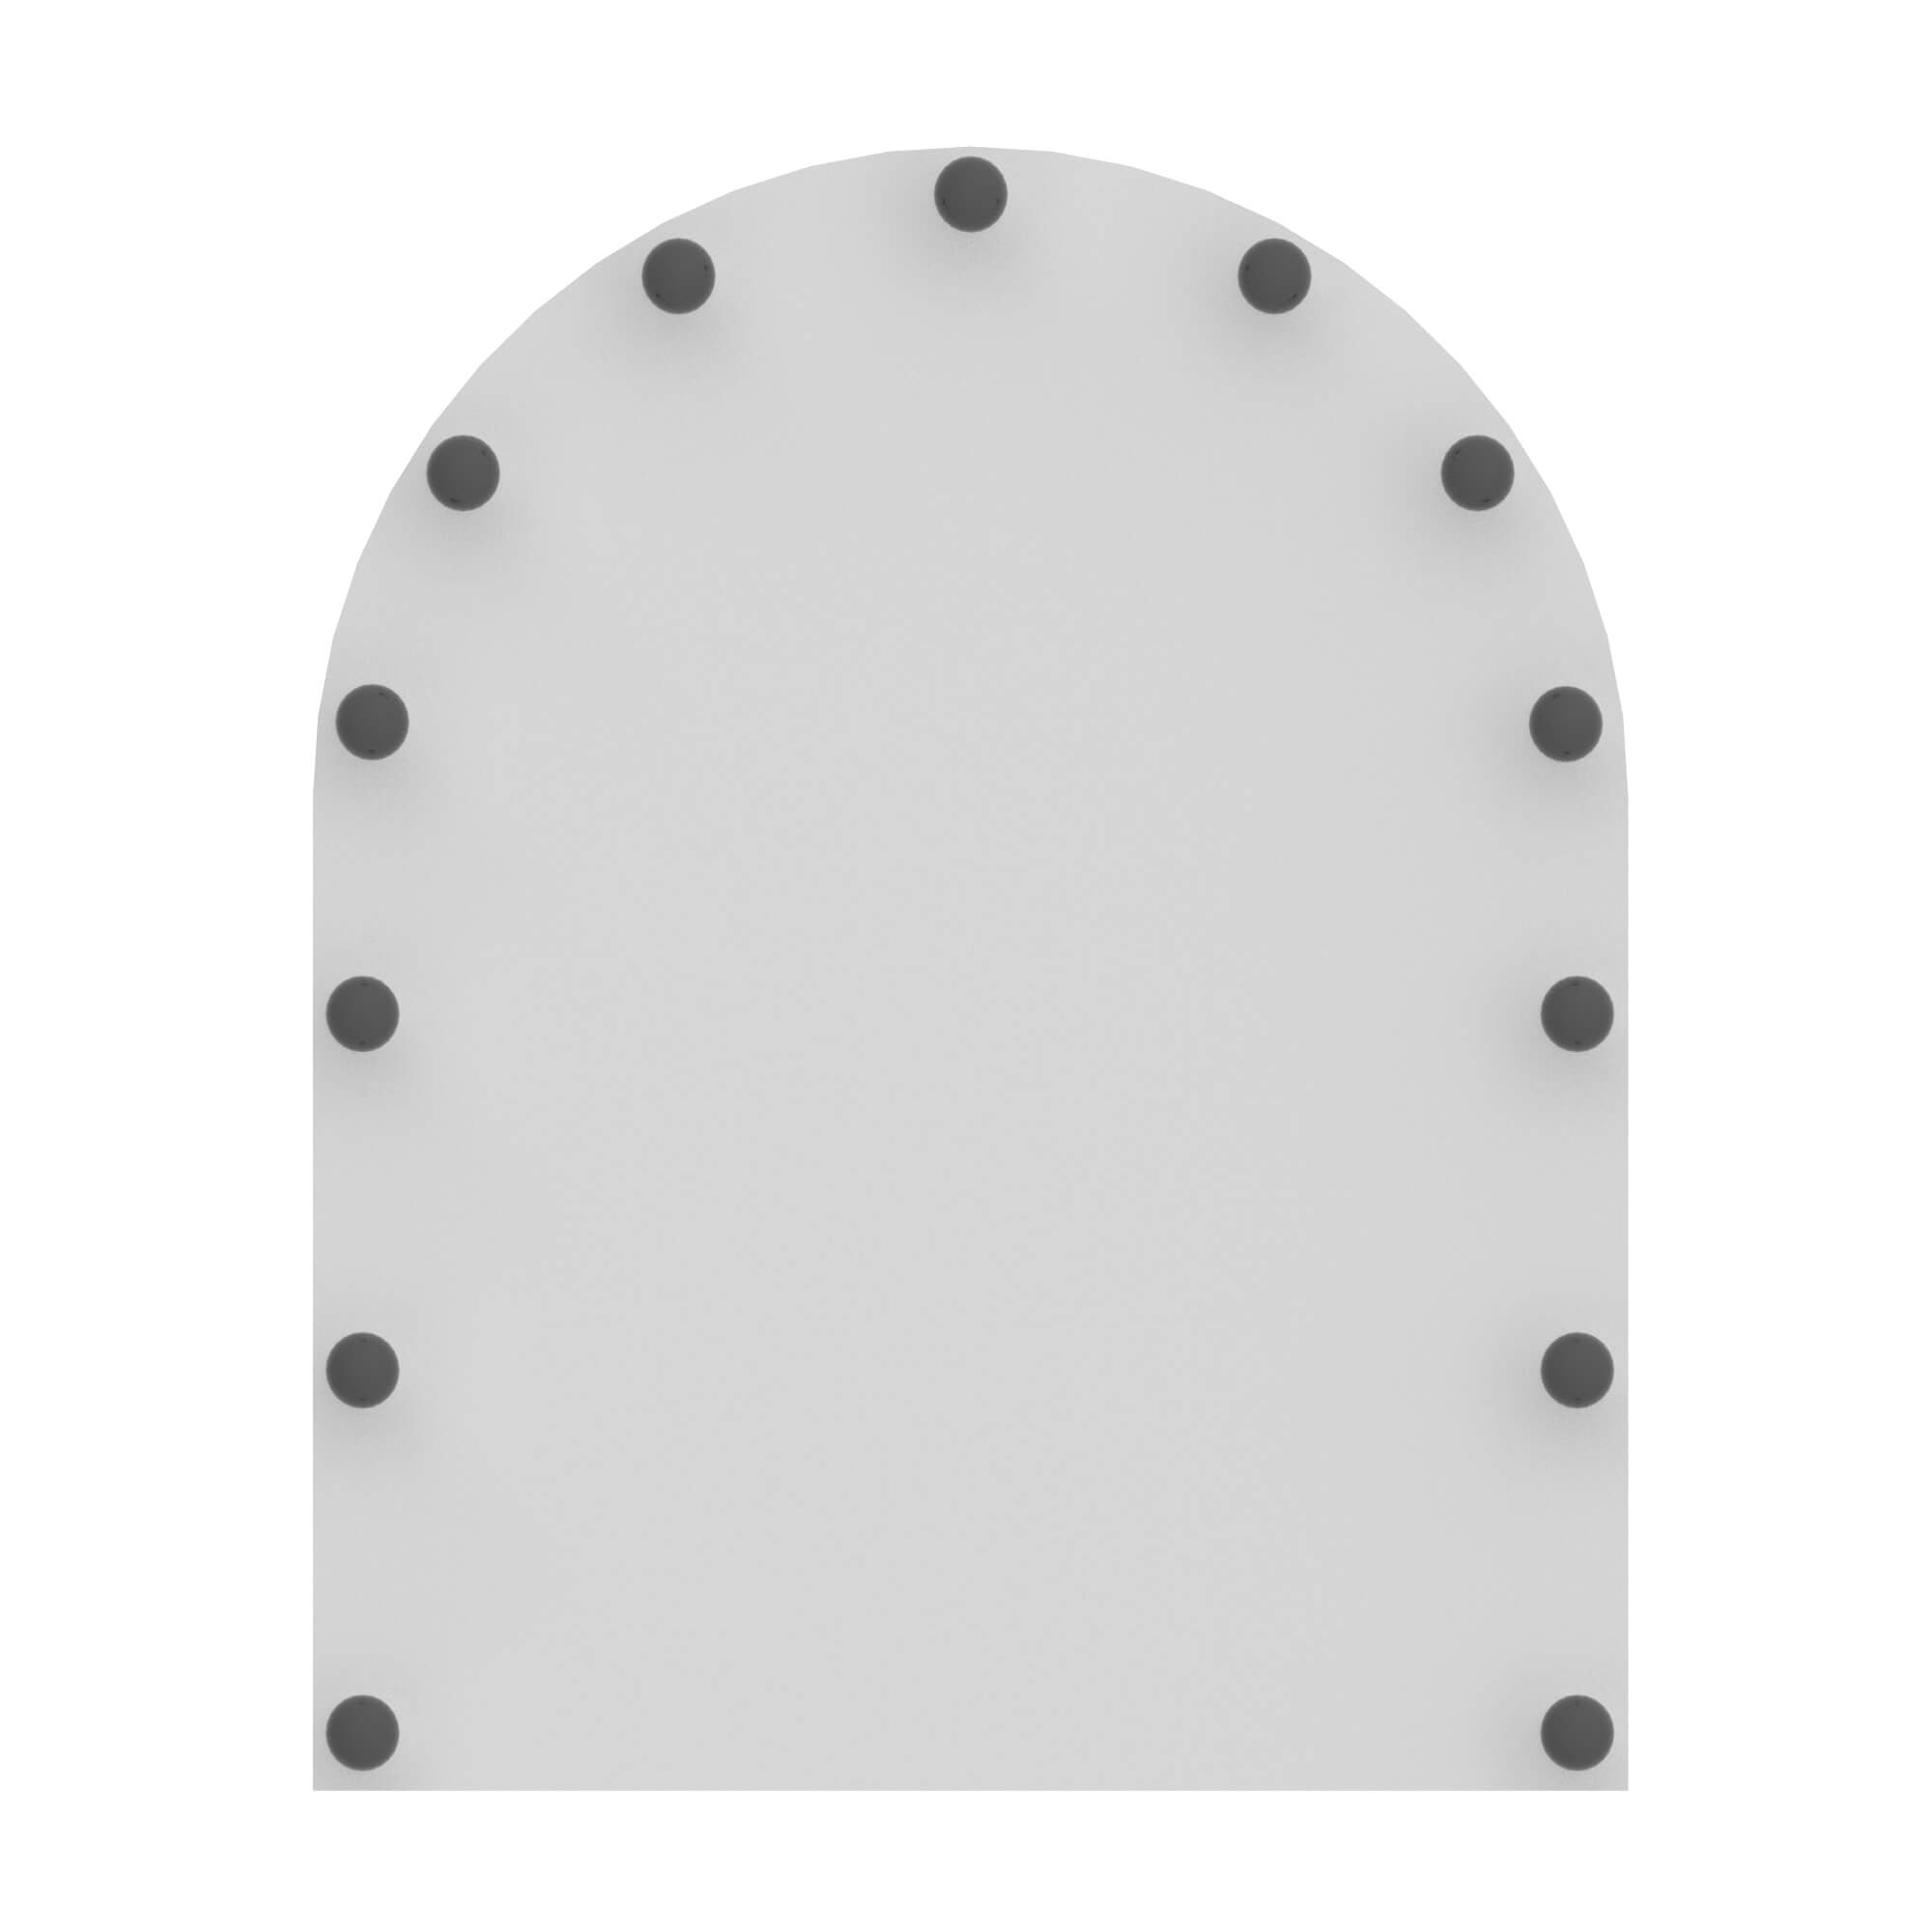 Model D (Arch)